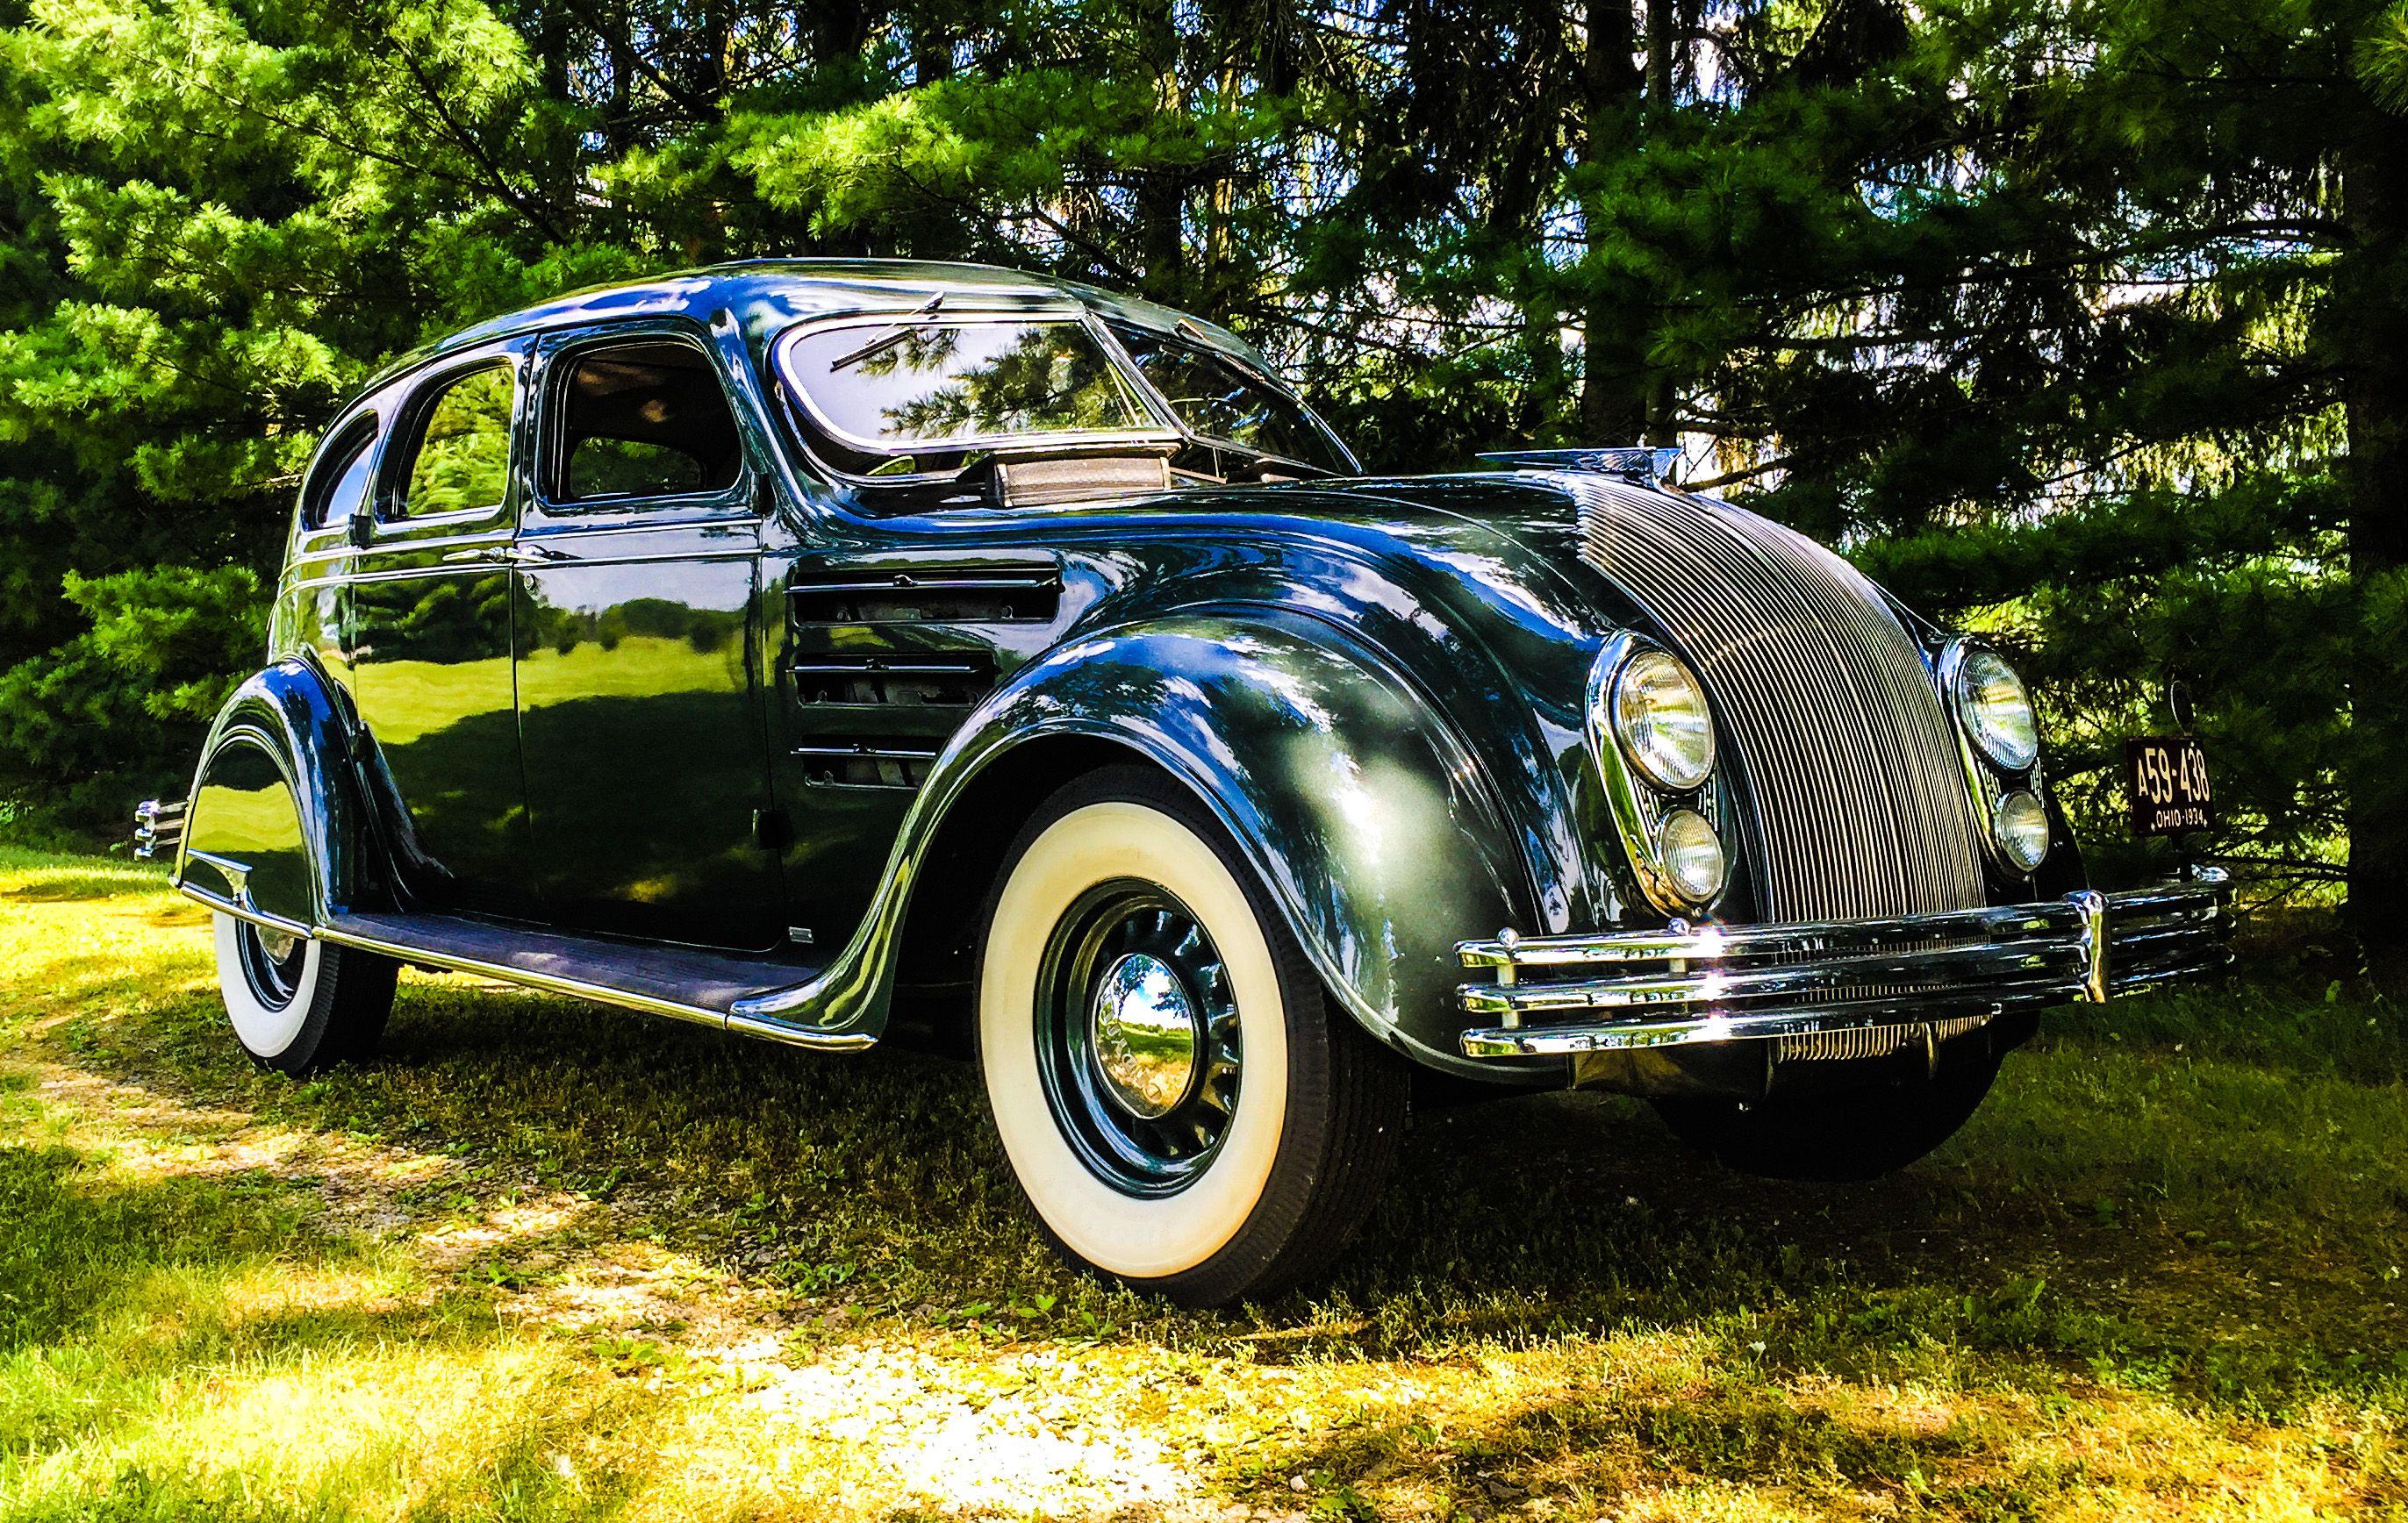 1934 Chrysler Airflow Cu Sedan With Images Chrysler Airflow